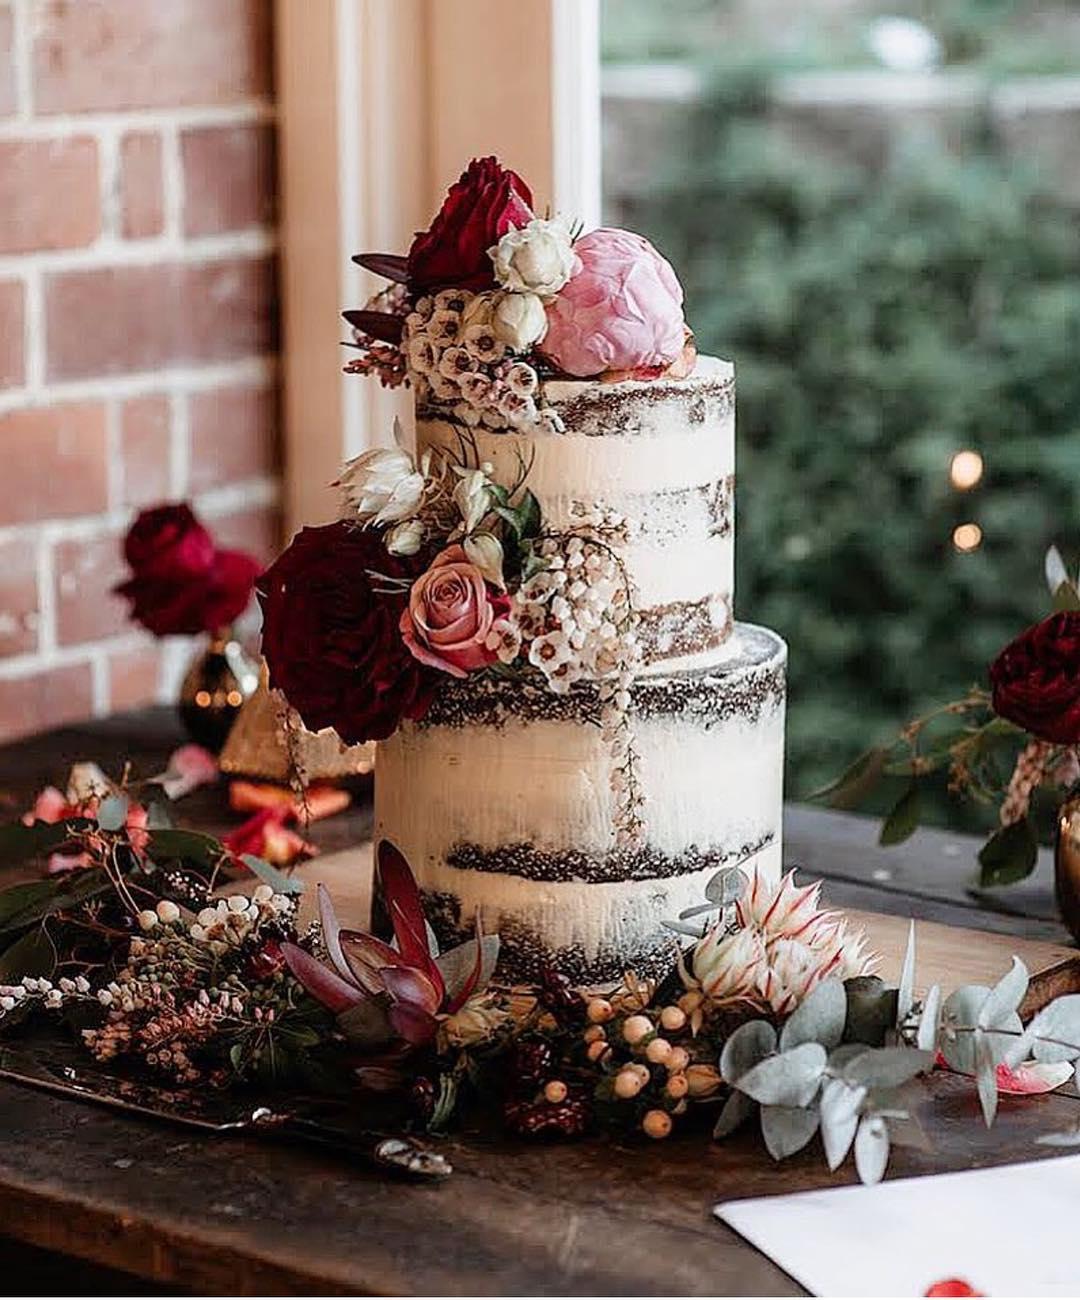 3 Well Travelled Bride Millies of Newrybar Wedding Cakes Byron Bay.jpg